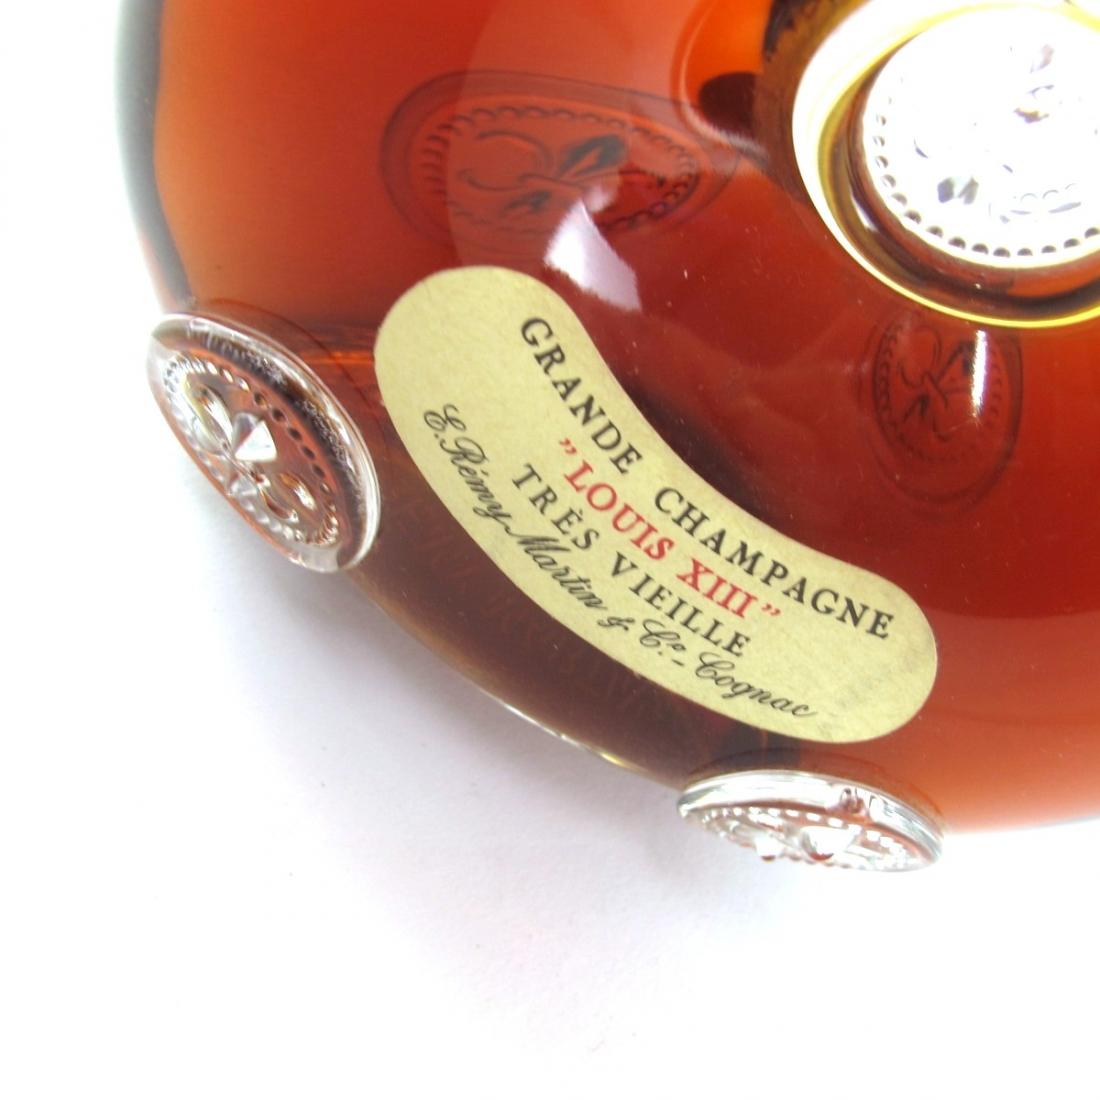 Remy Martin Louis XIII Cognac Tres Vieille 1970s